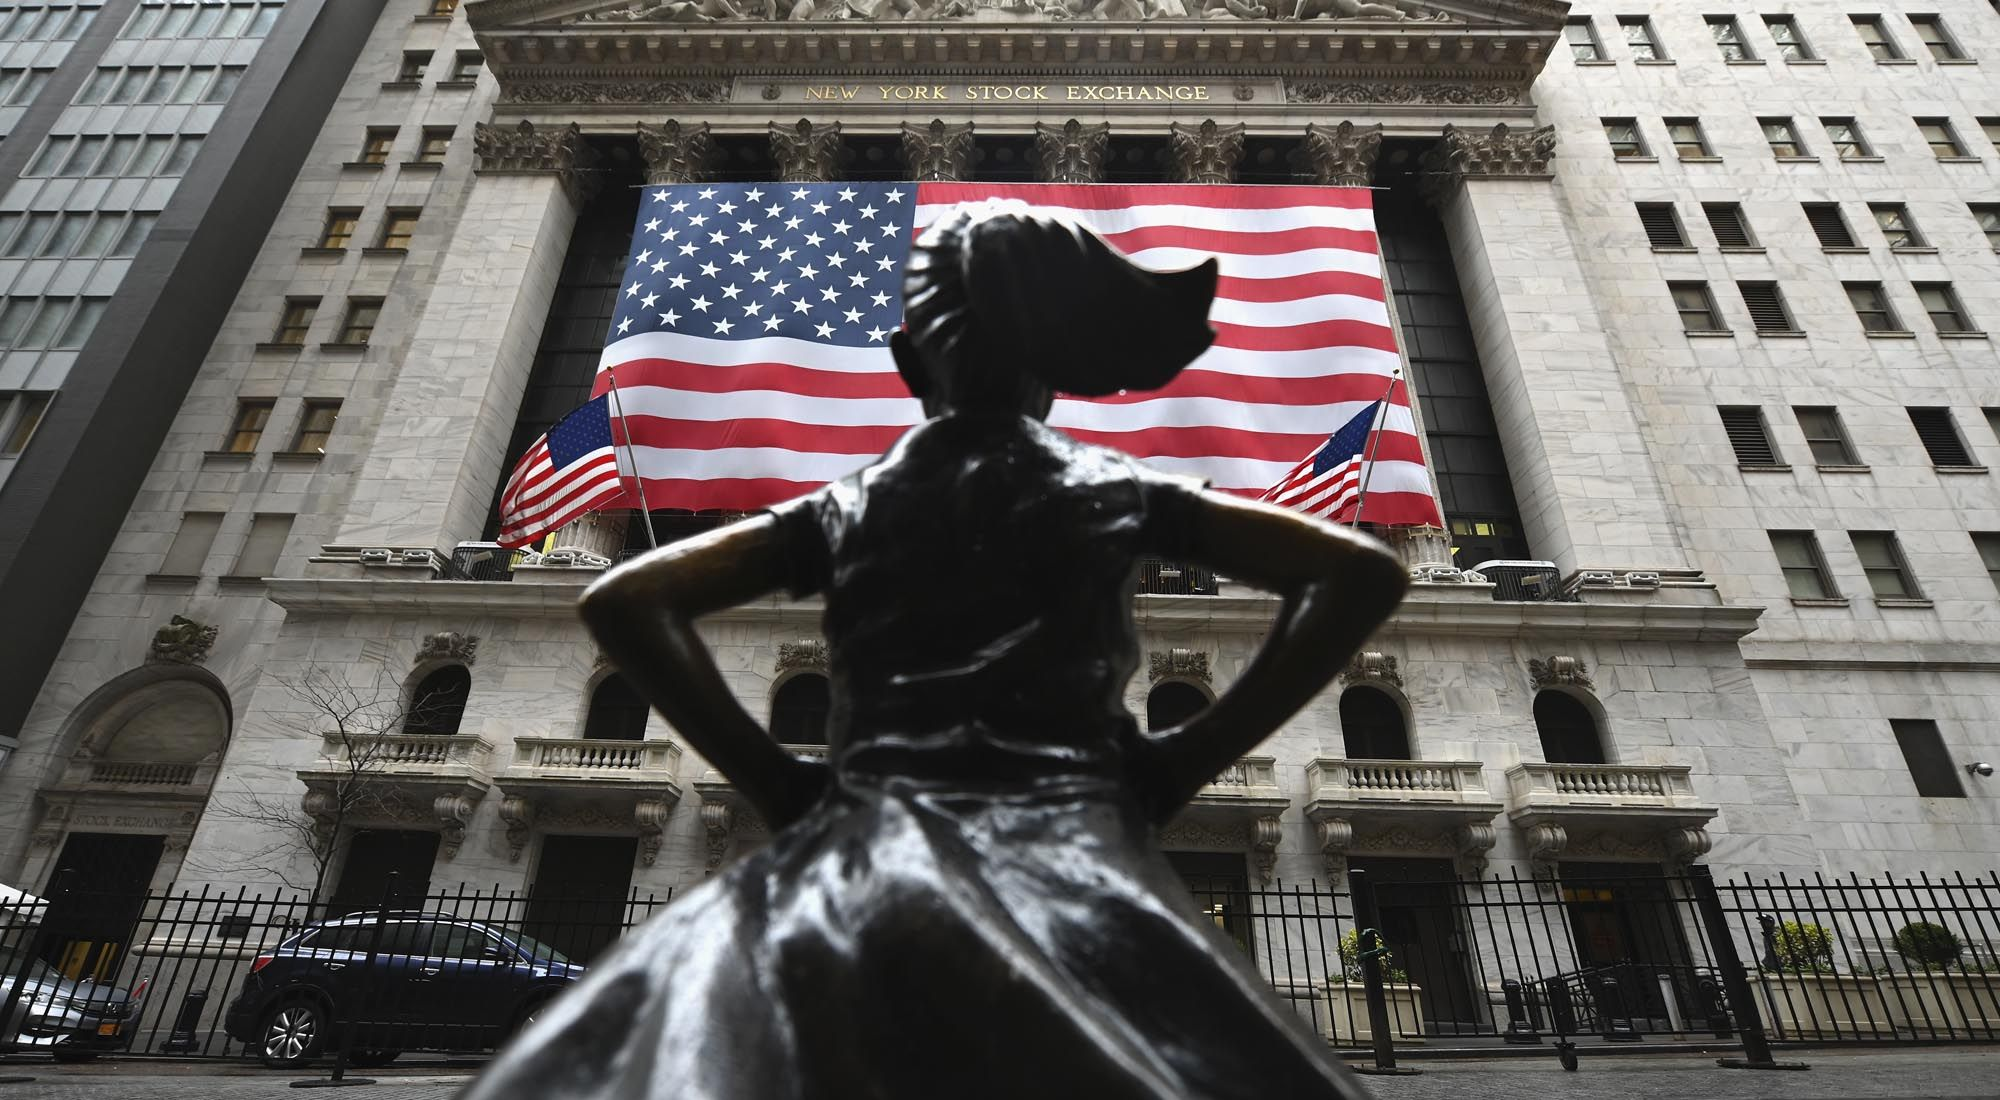 Bolsa de comercio de Estados Unidos.